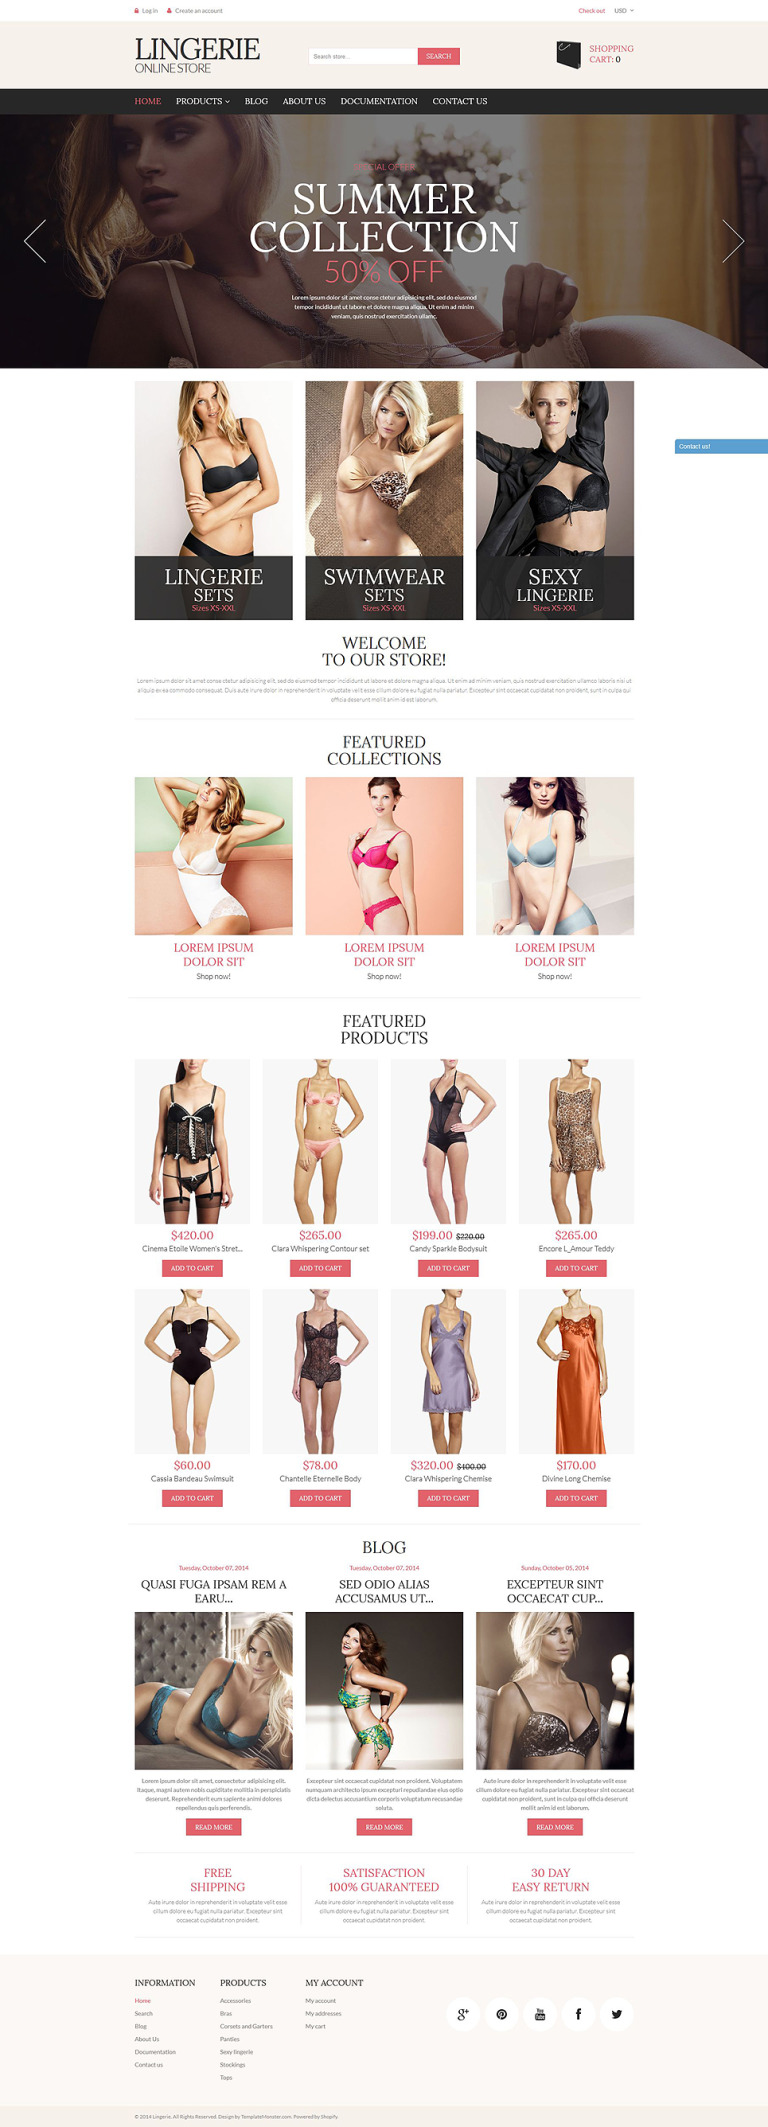 Lingerie Store Shopify Theme New Screenshots BIG